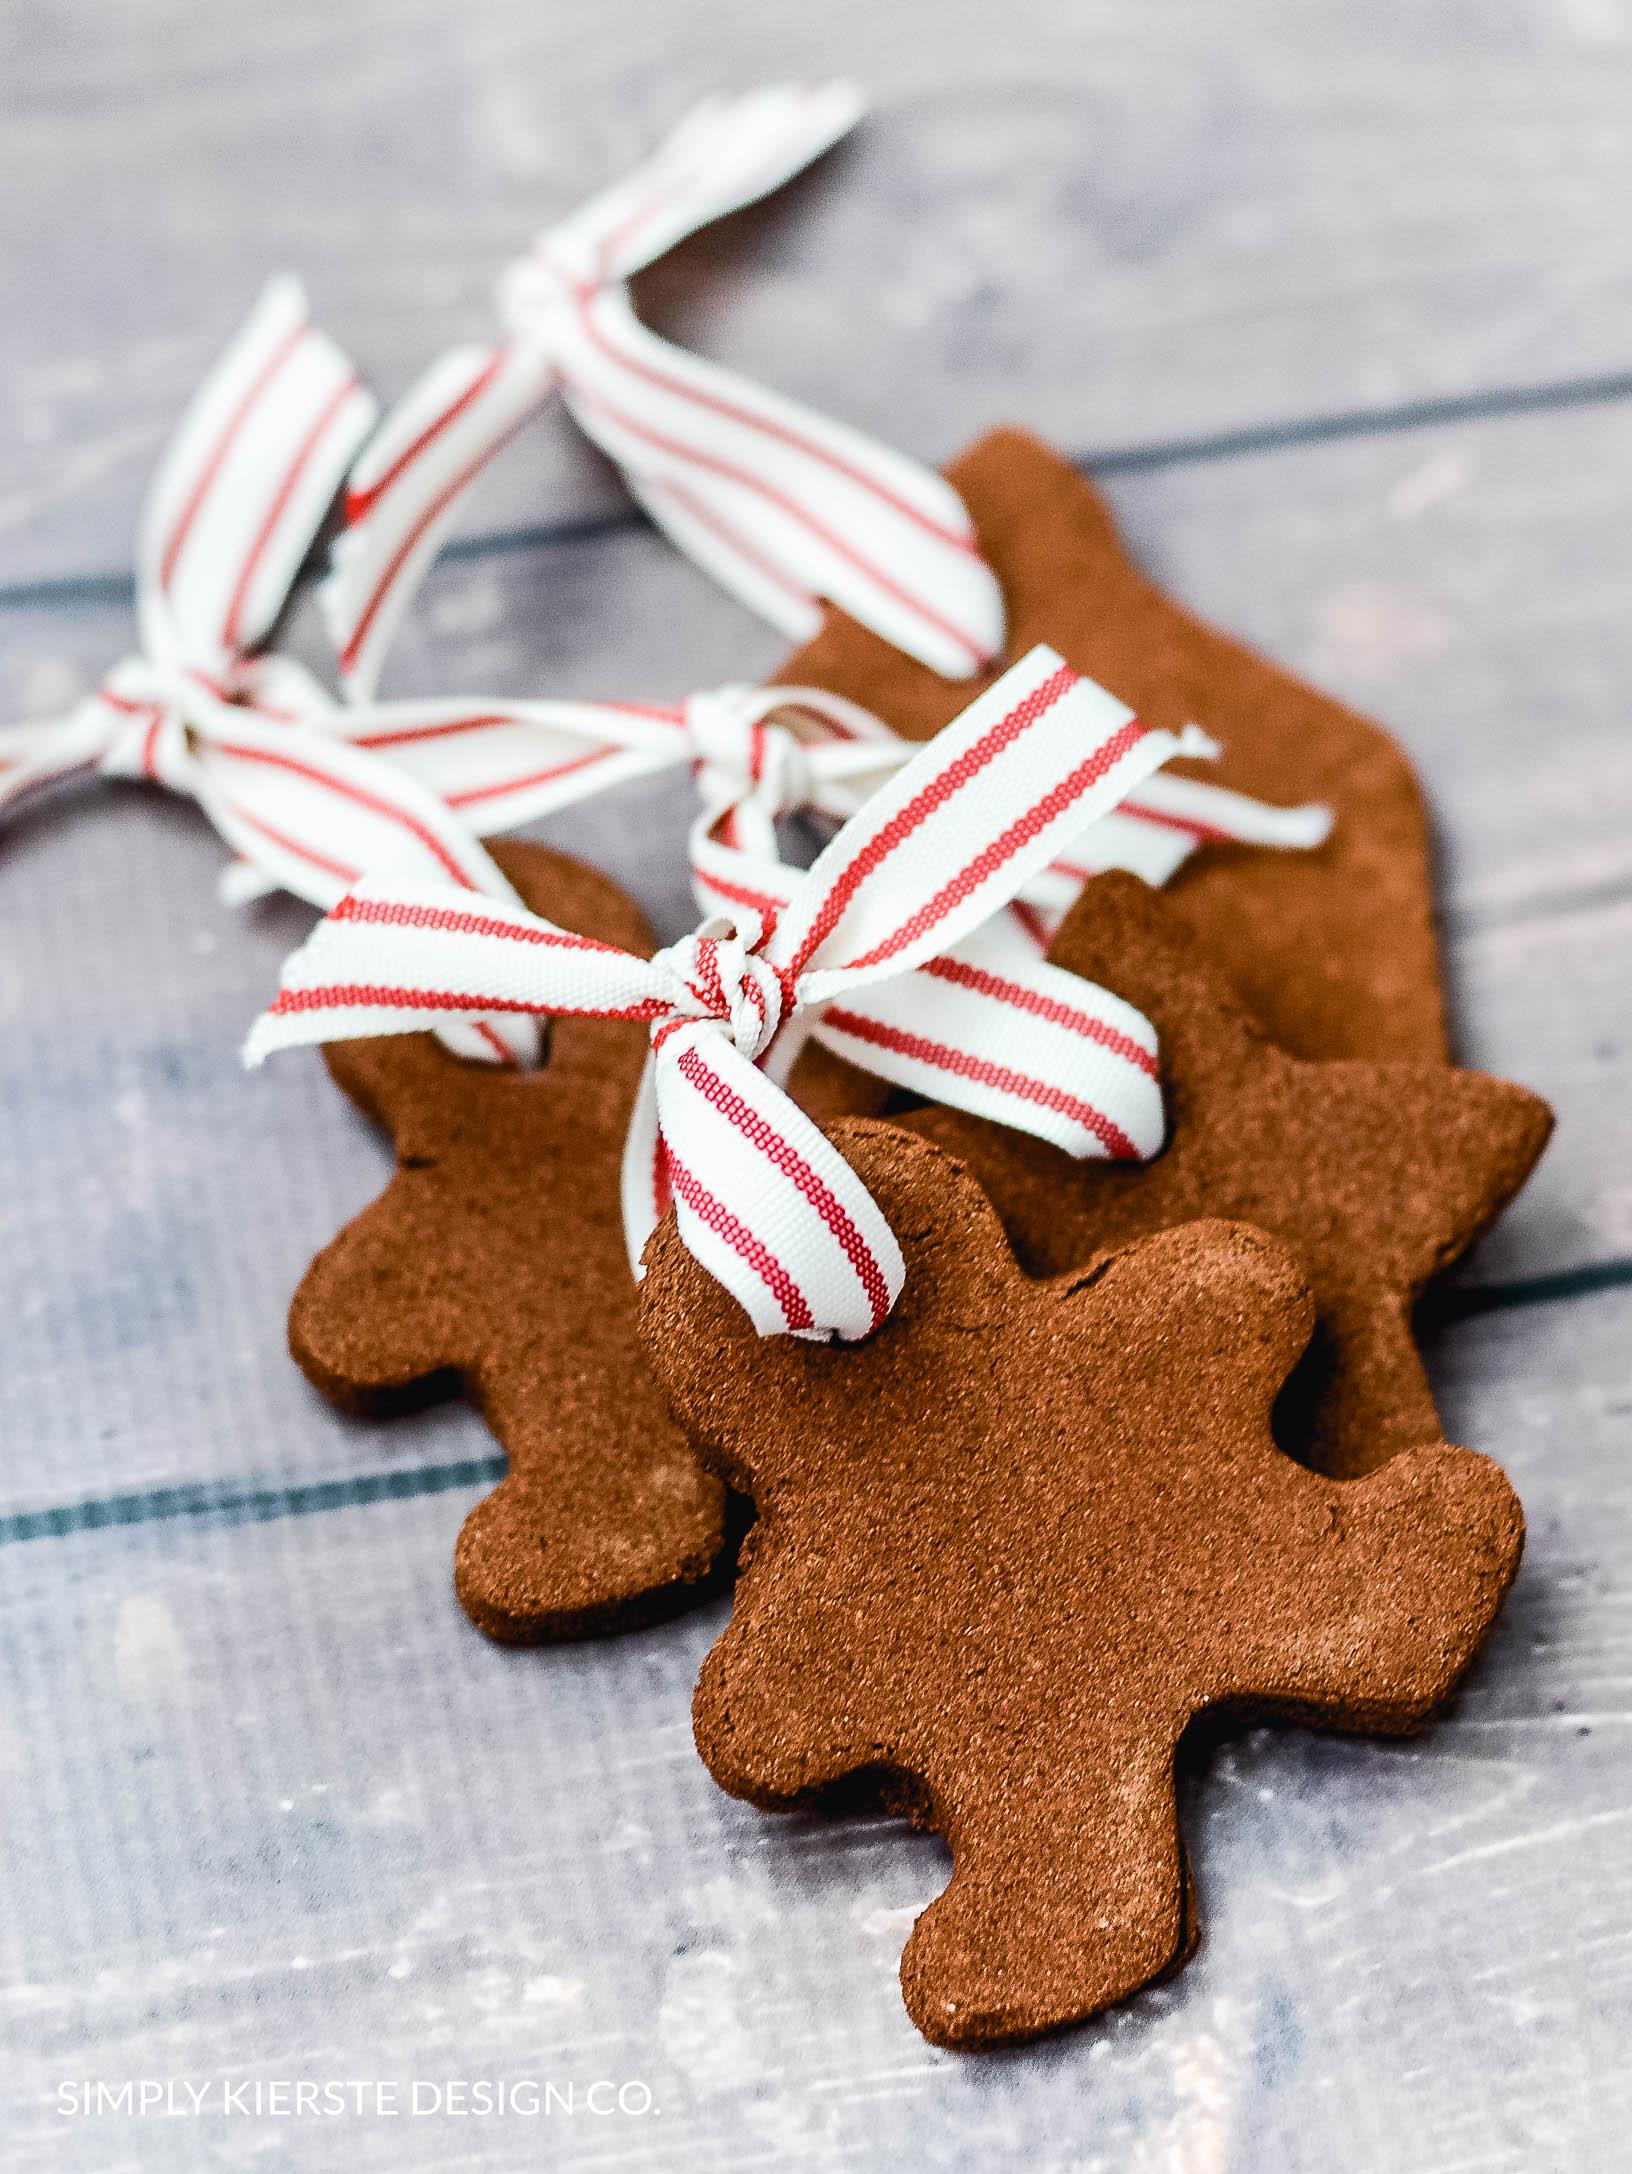 Easy Handmade Cinnamon Ornaments | Christmas Ornaments | oldsaltfarm.com #handmadeornaments #diyornaments #easychristmasideas